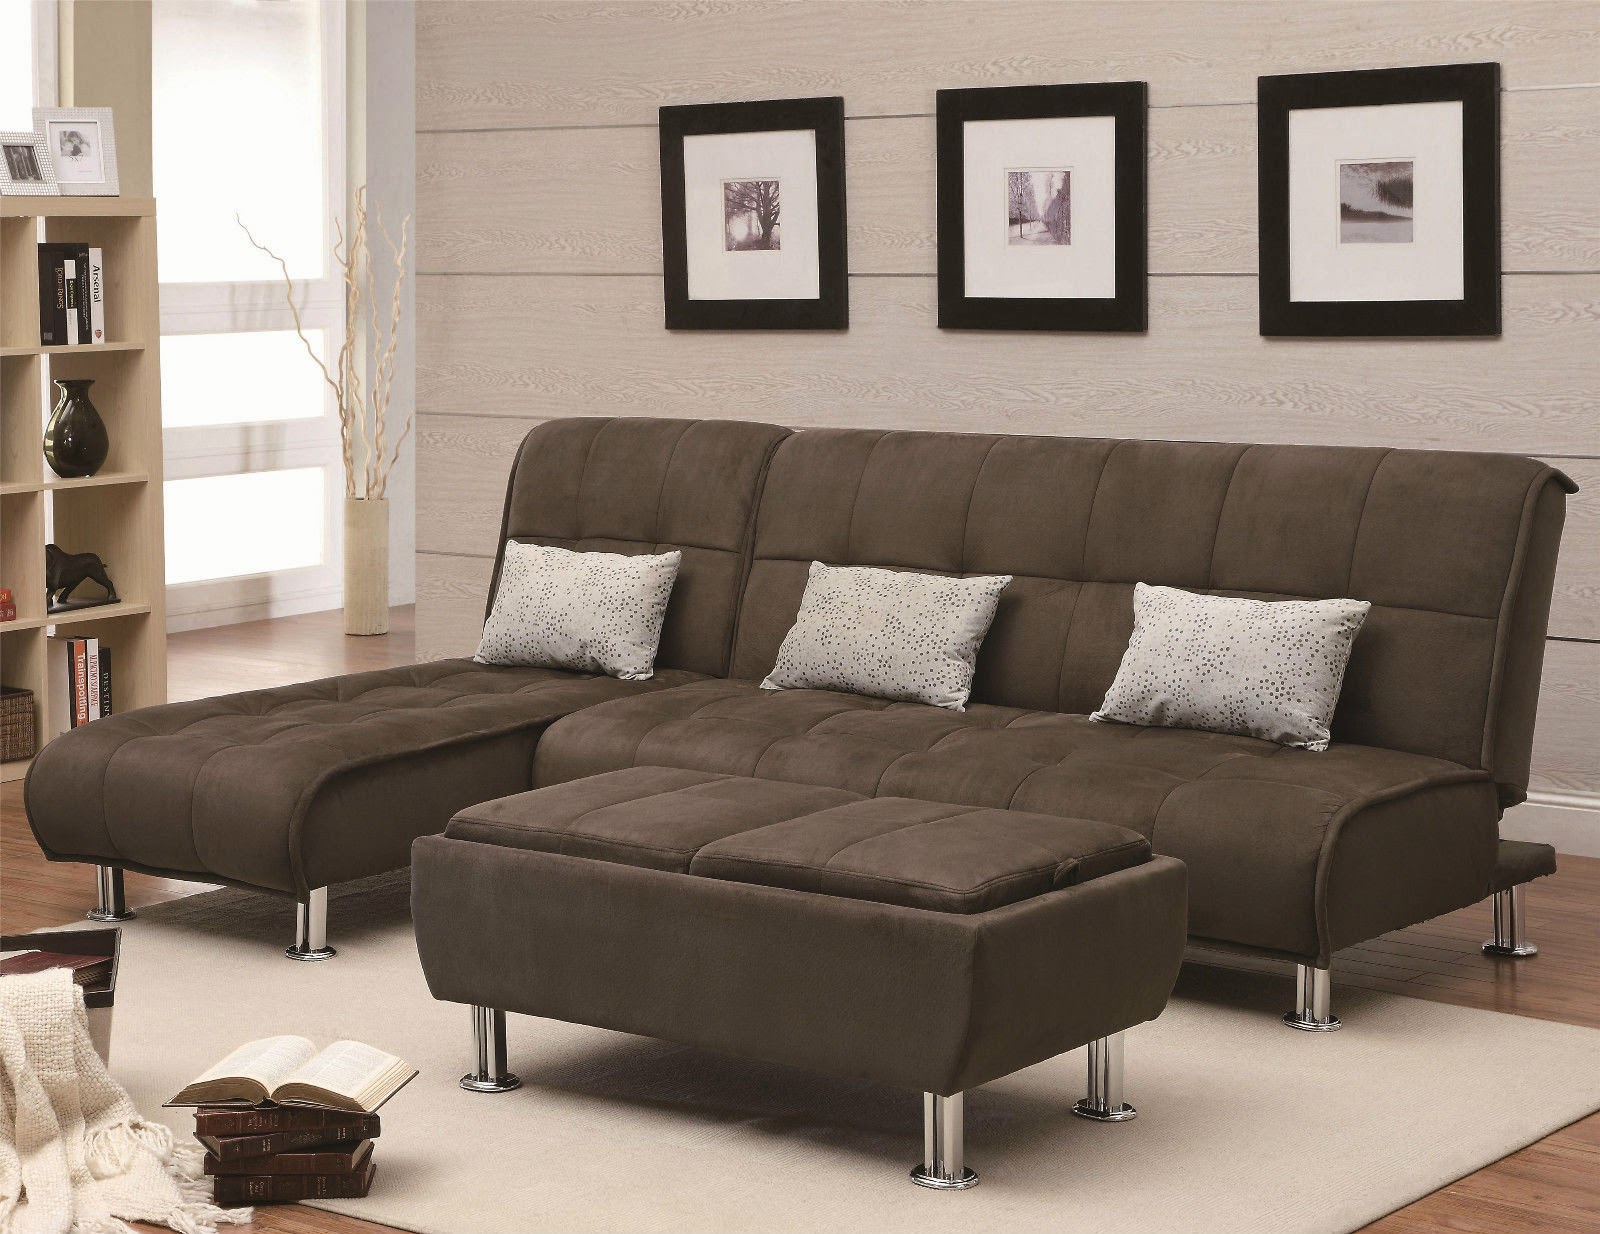 3 Popular Main Colors in Microfiber Sectional Sleeper Sofa